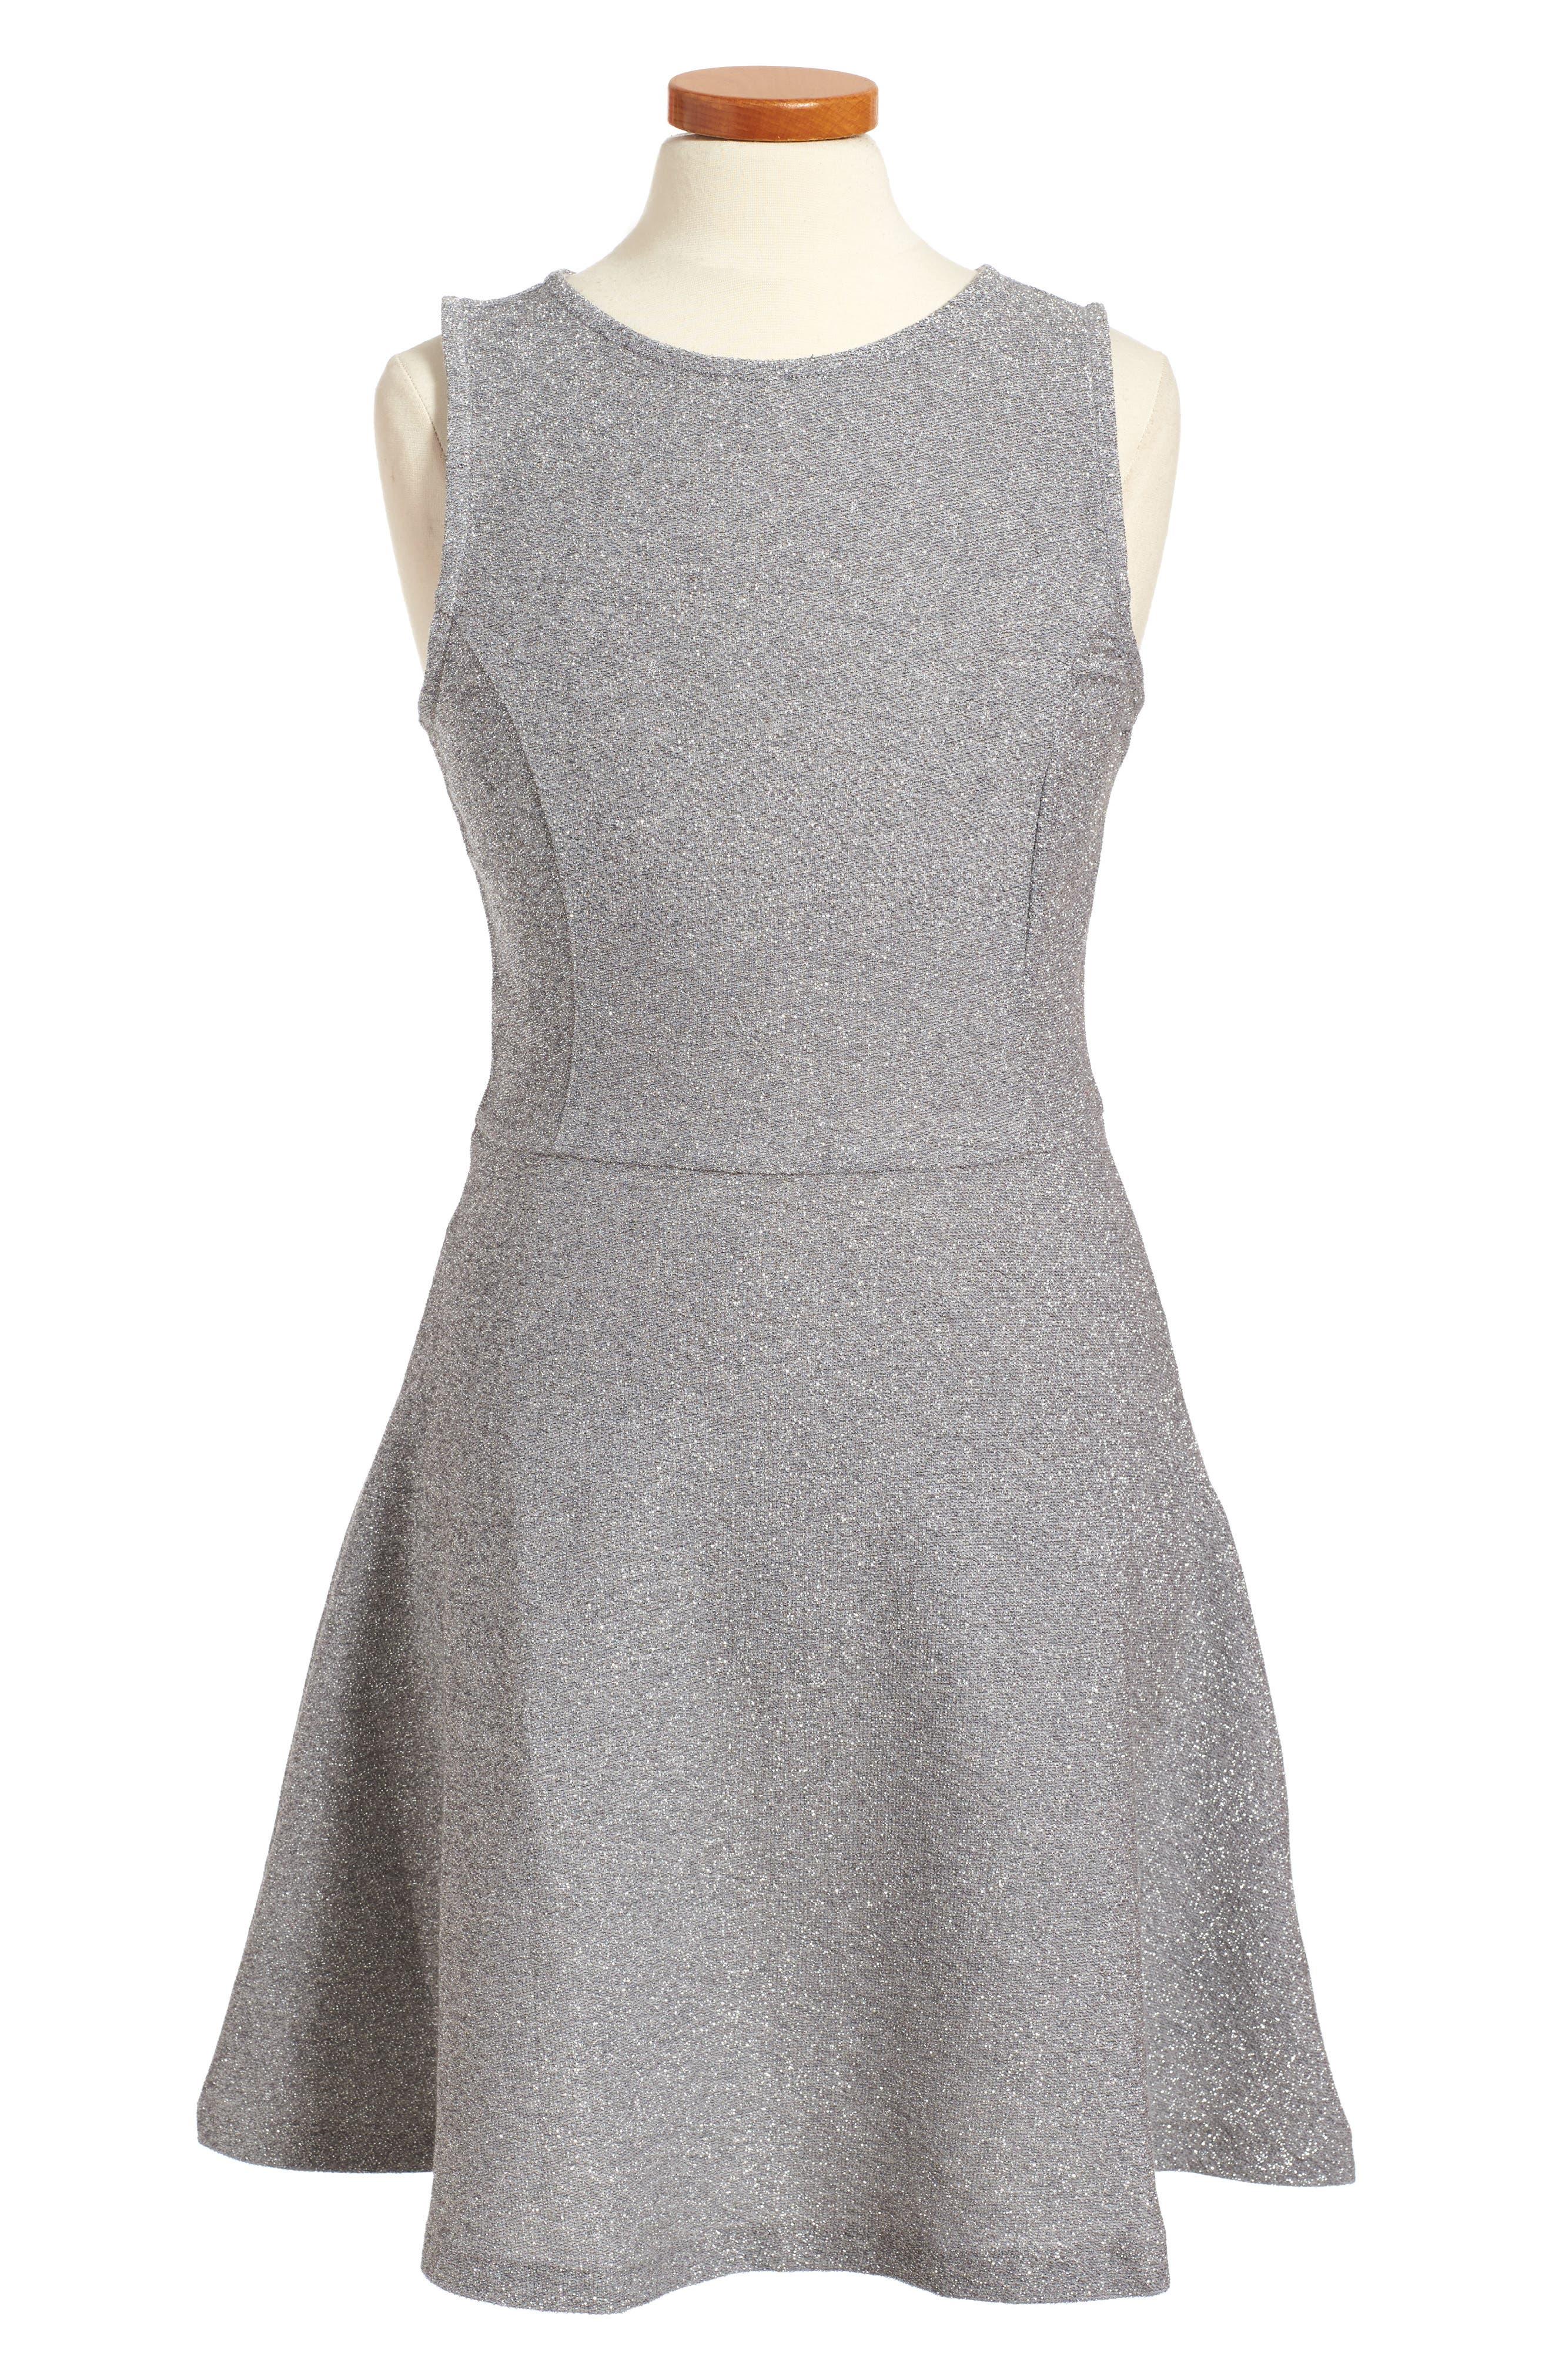 Sparkle Skater Dress,                             Main thumbnail 1, color,                             040